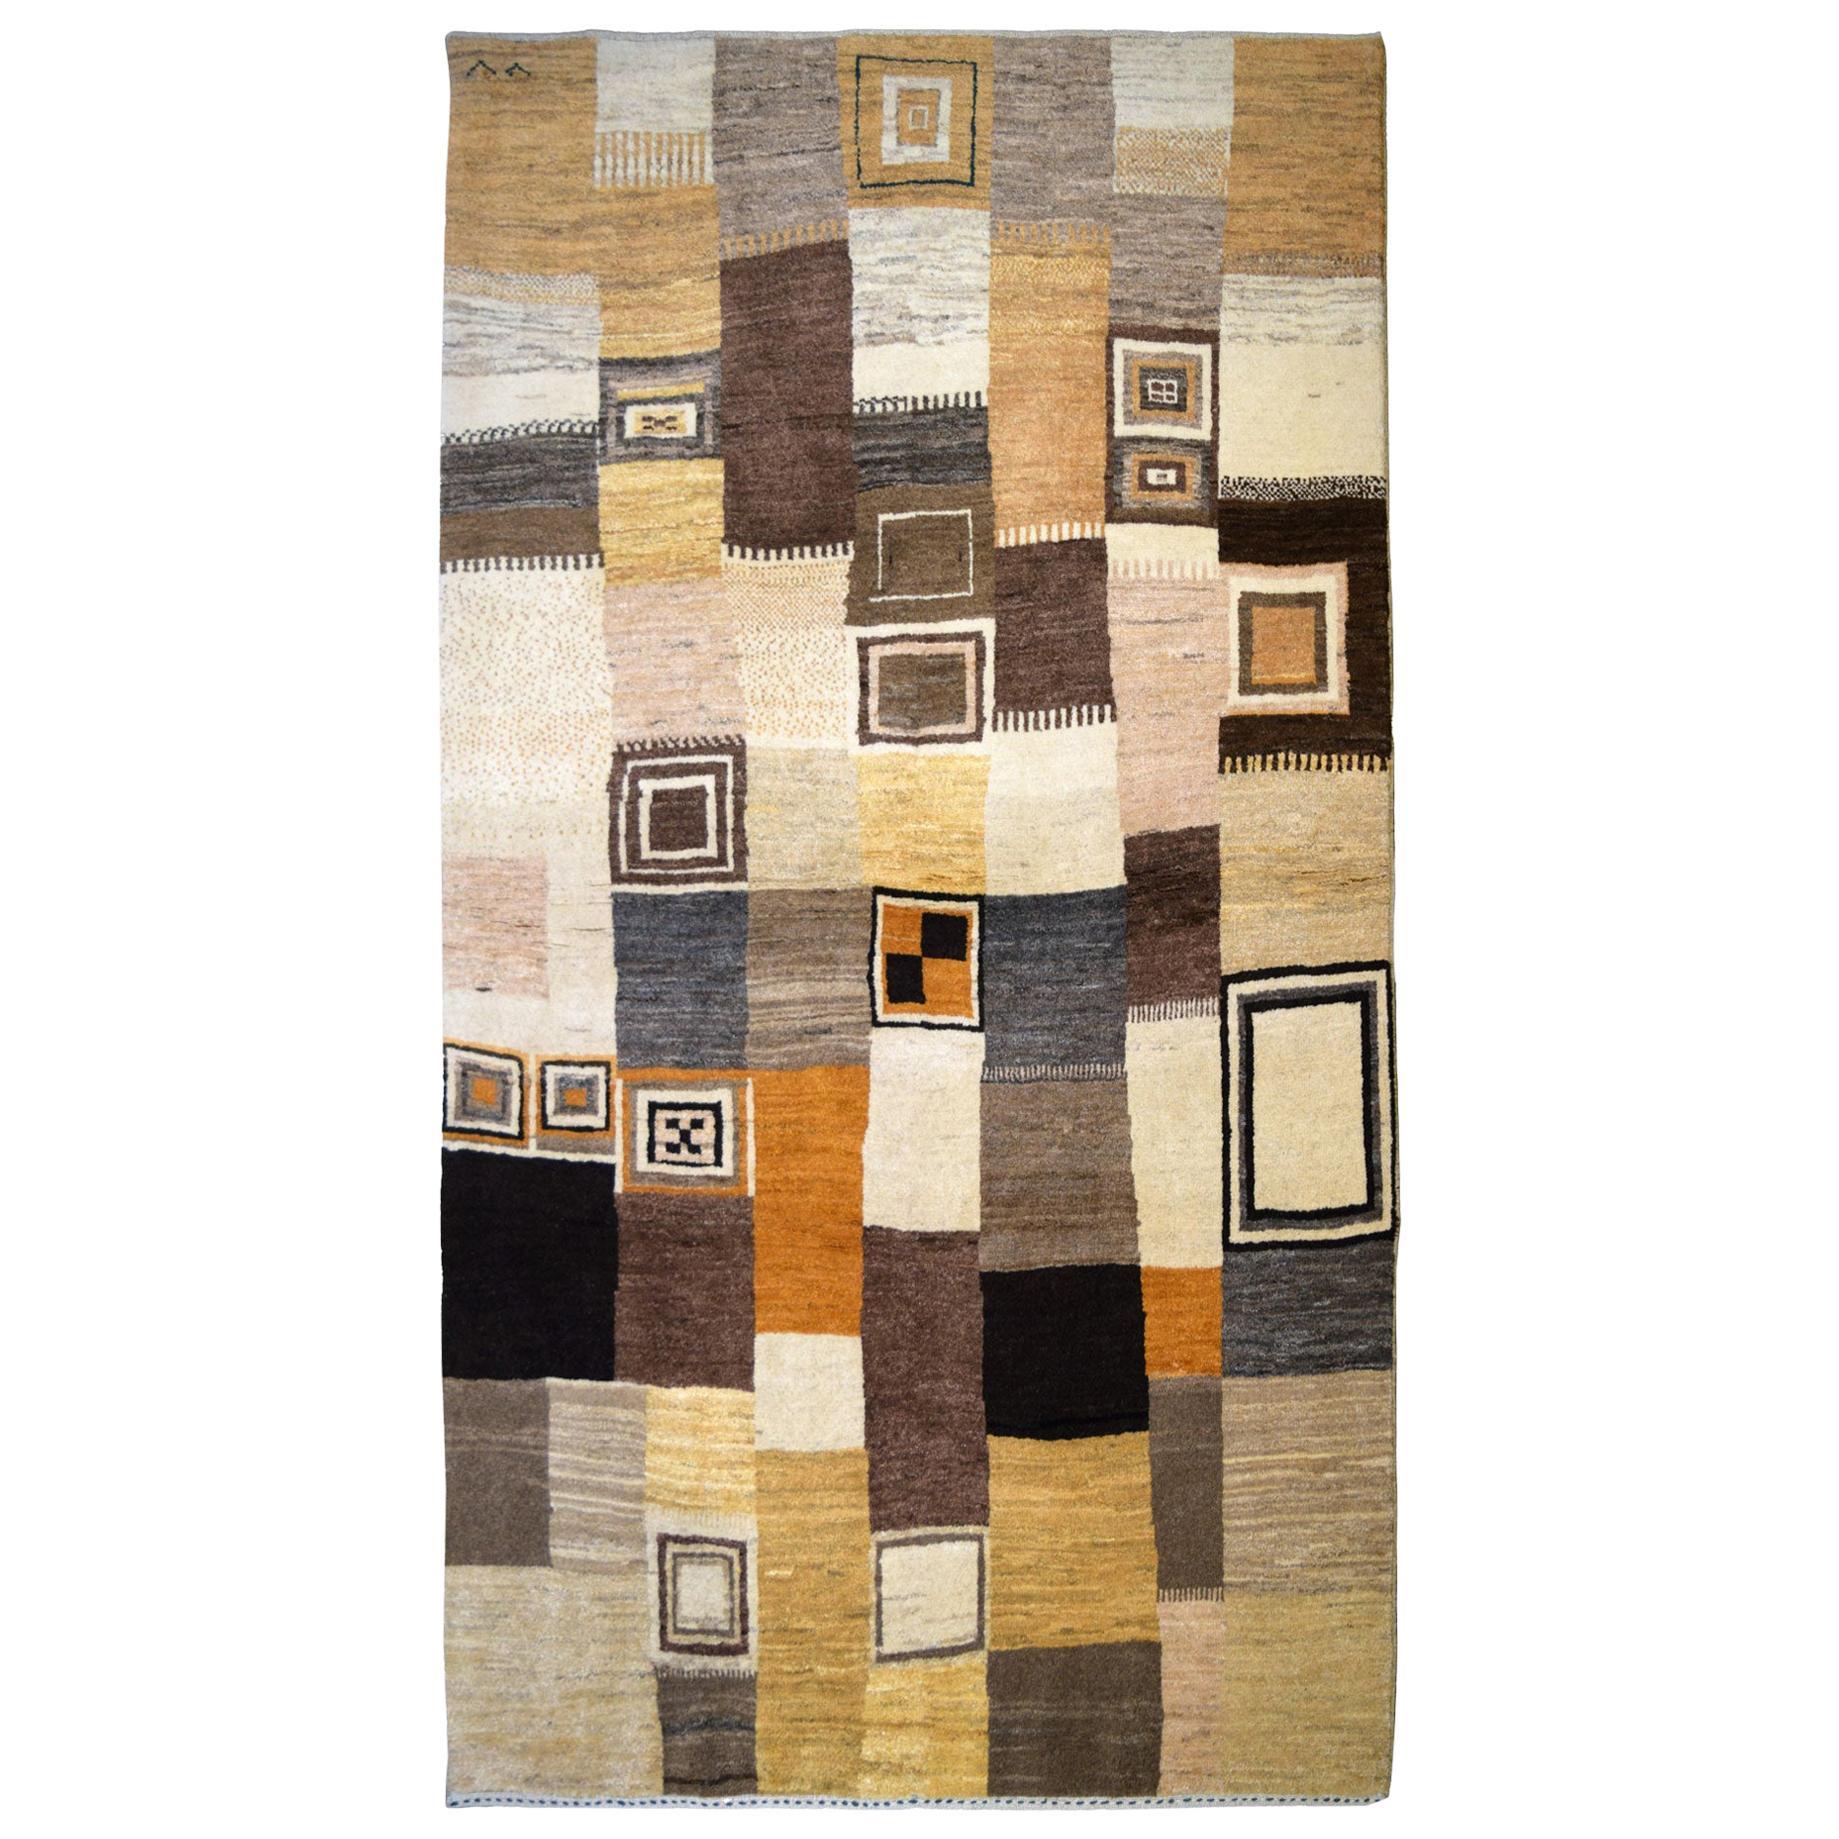 Neutral-Toned Cream and Brown Wool Persian Luri Gabbeh Carpet